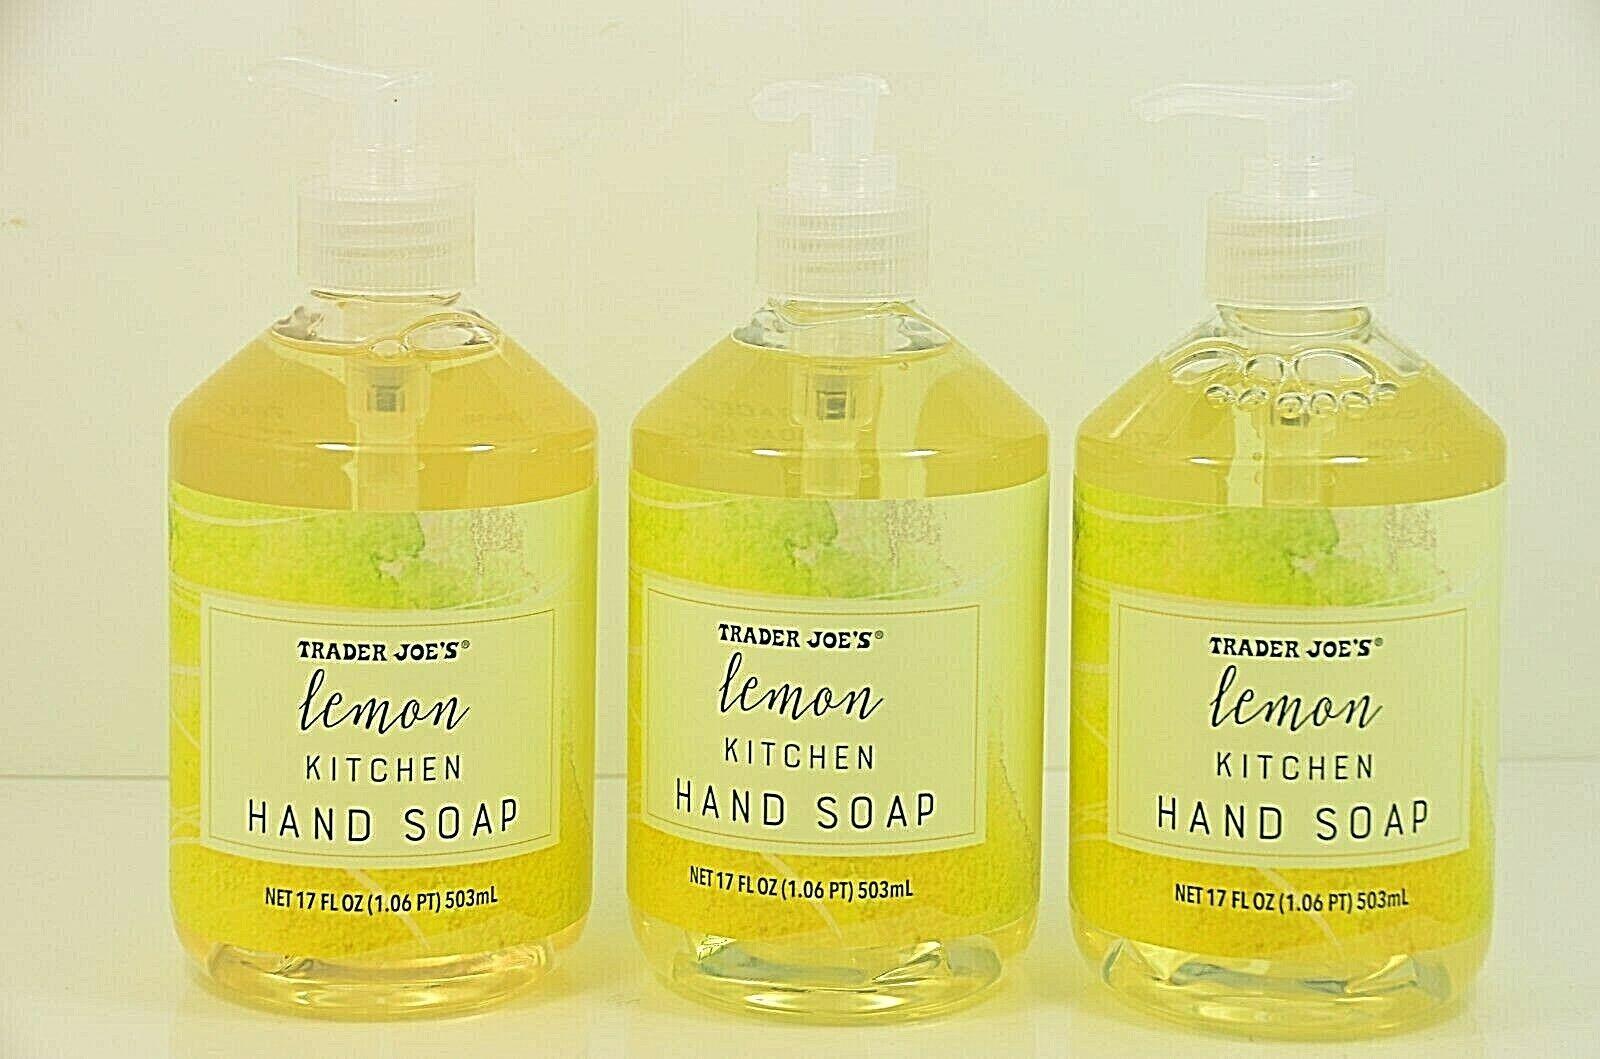 TRADER JOES - LEMON Kitchen Hand Soap